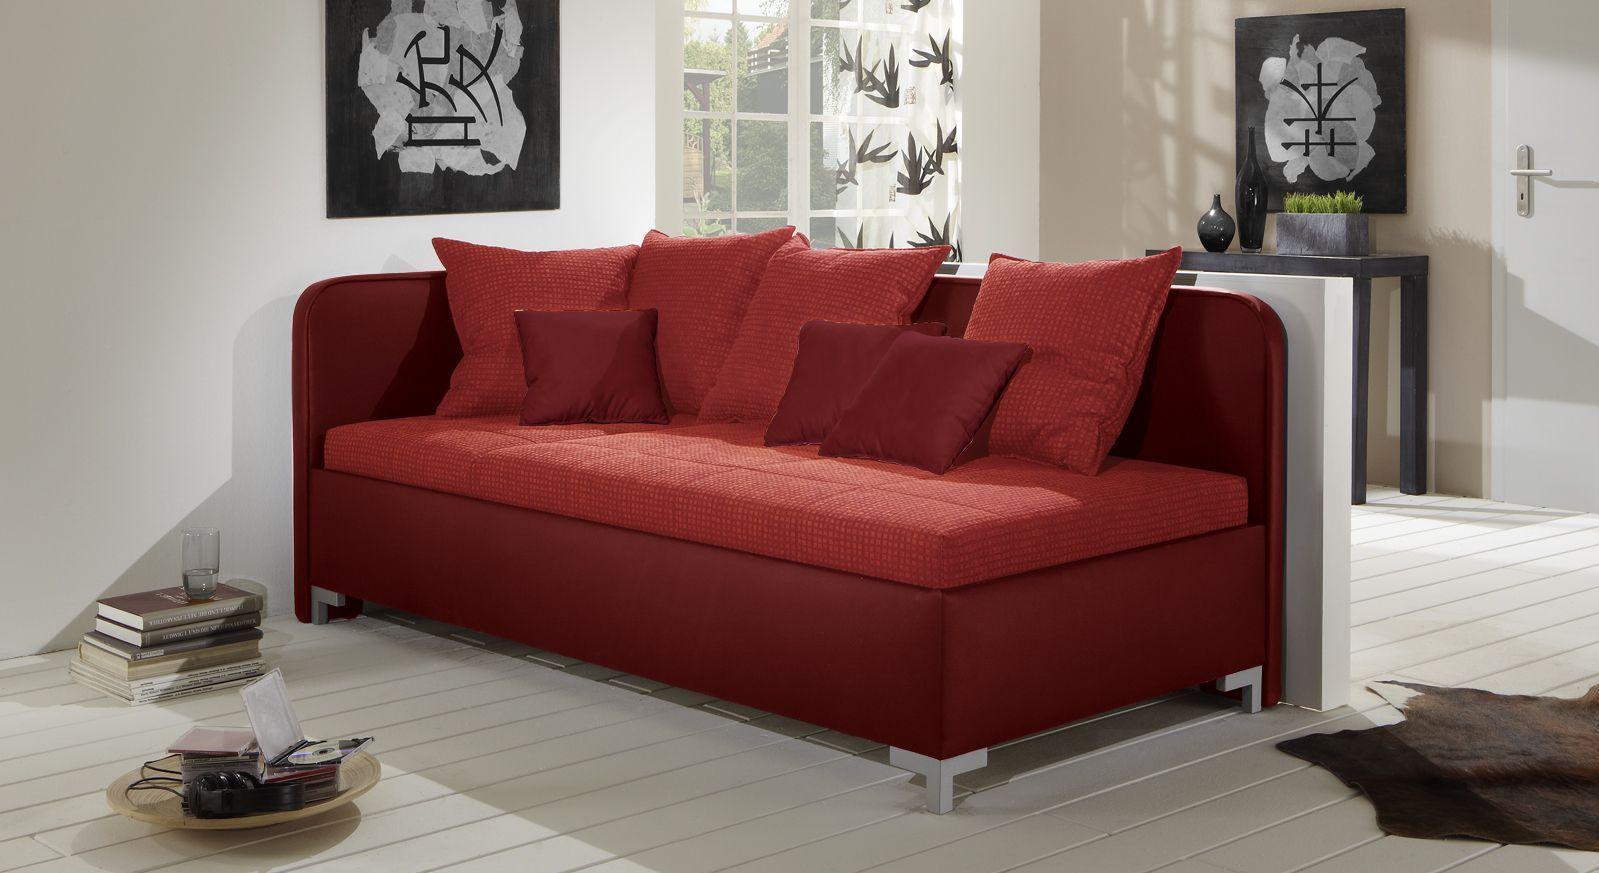 Studioliege Anteo aus rotem Leder